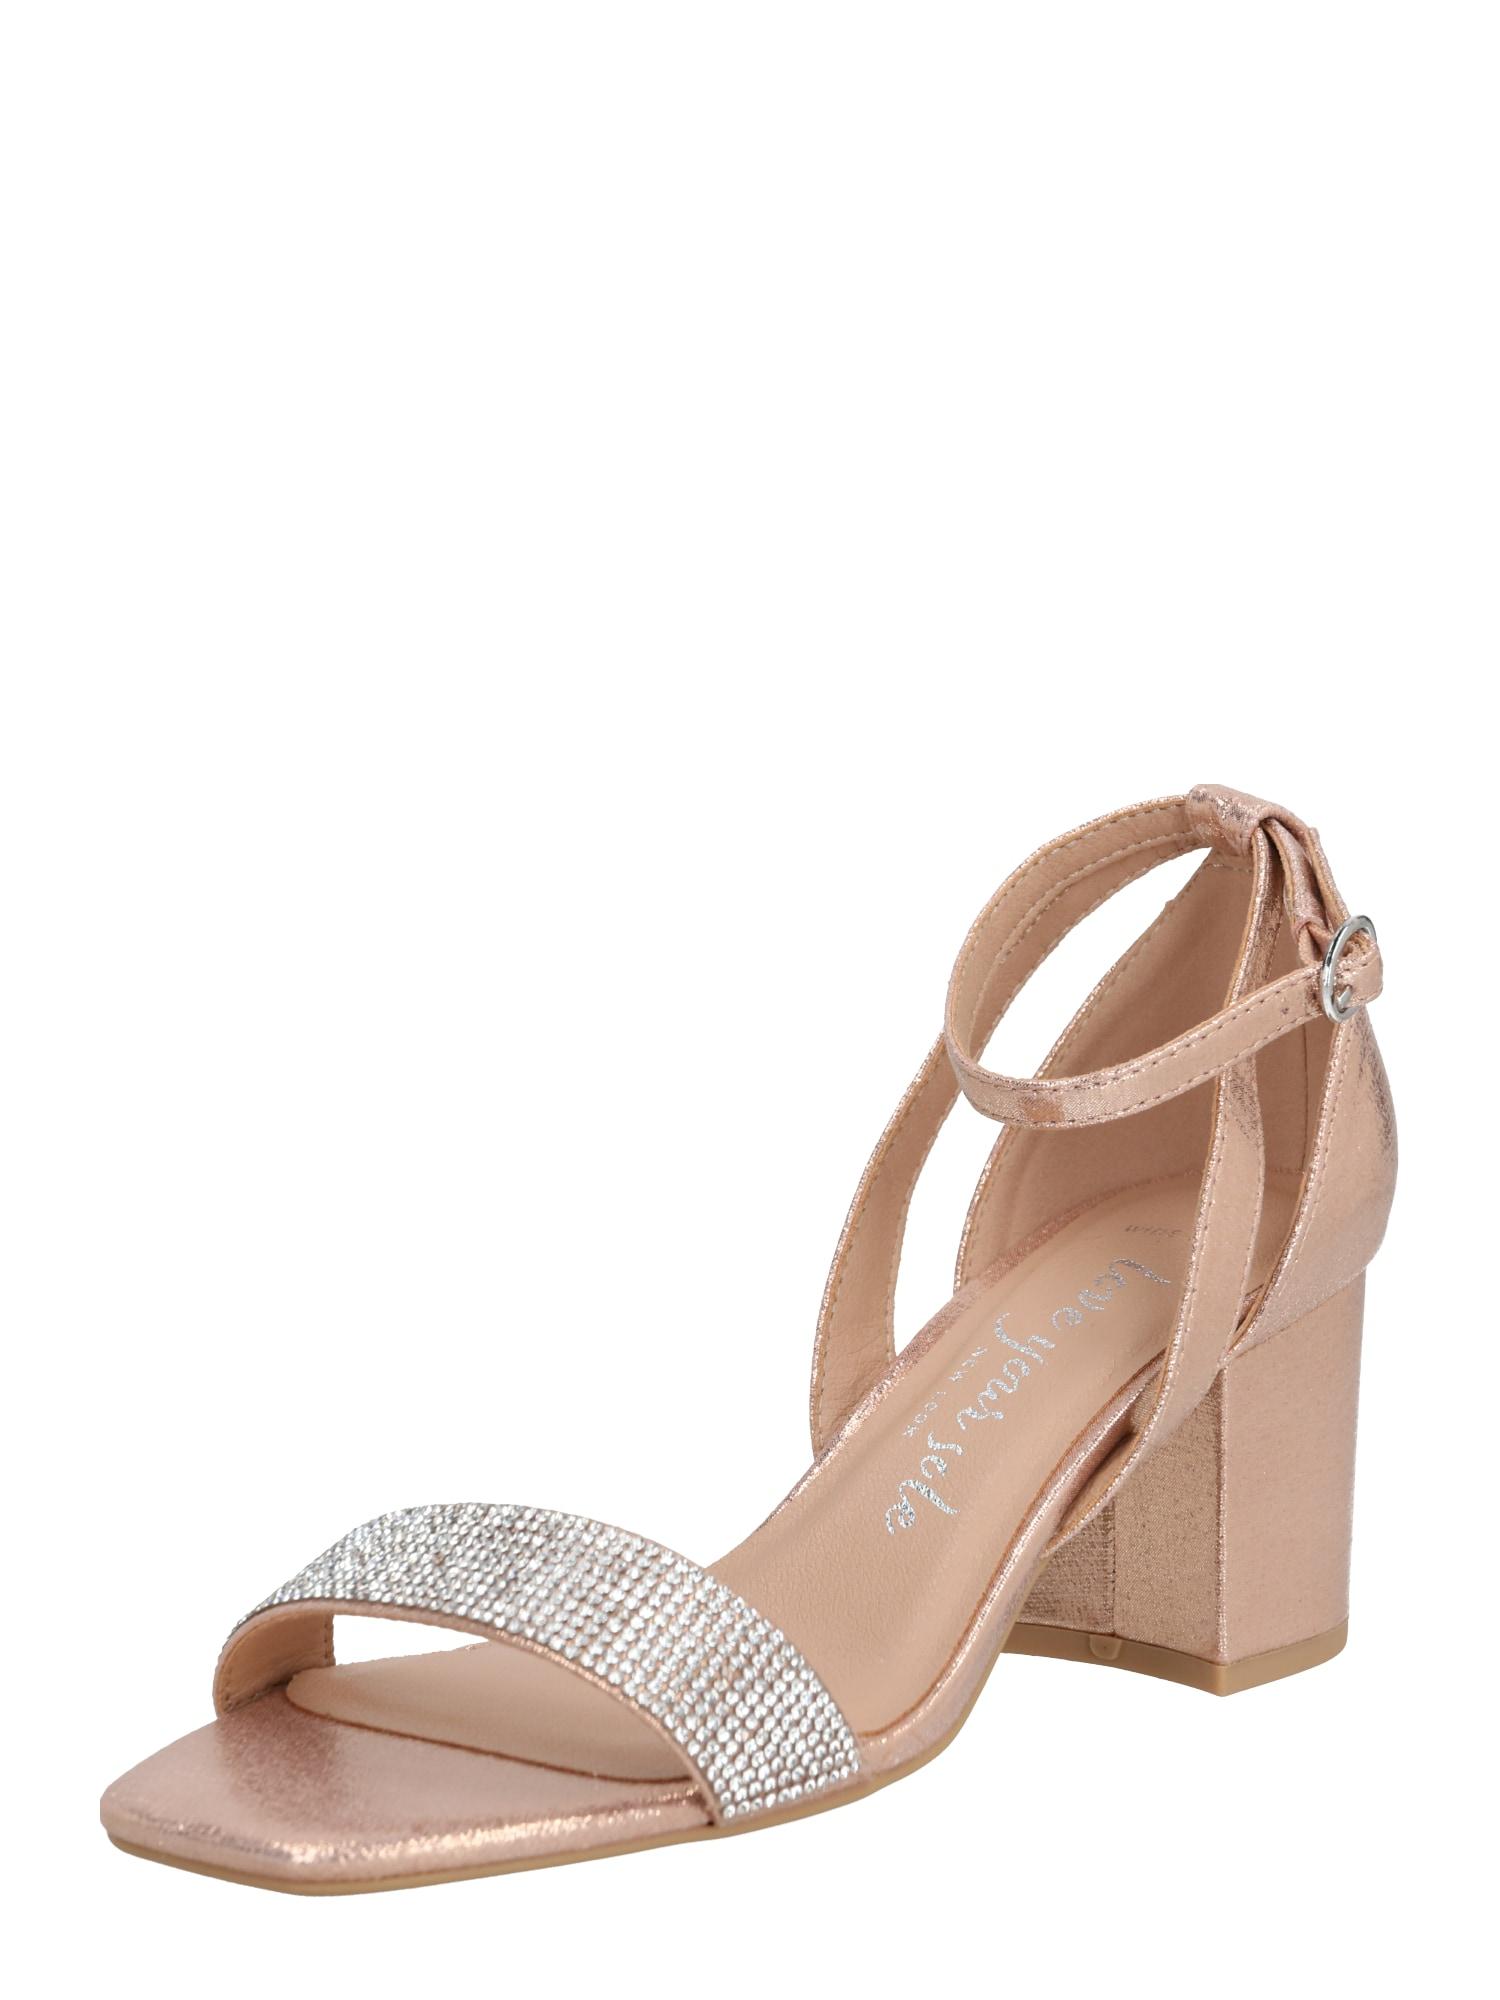 NEW LOOK Sandále 'TIBBY'  zlatá / béžová / ružová